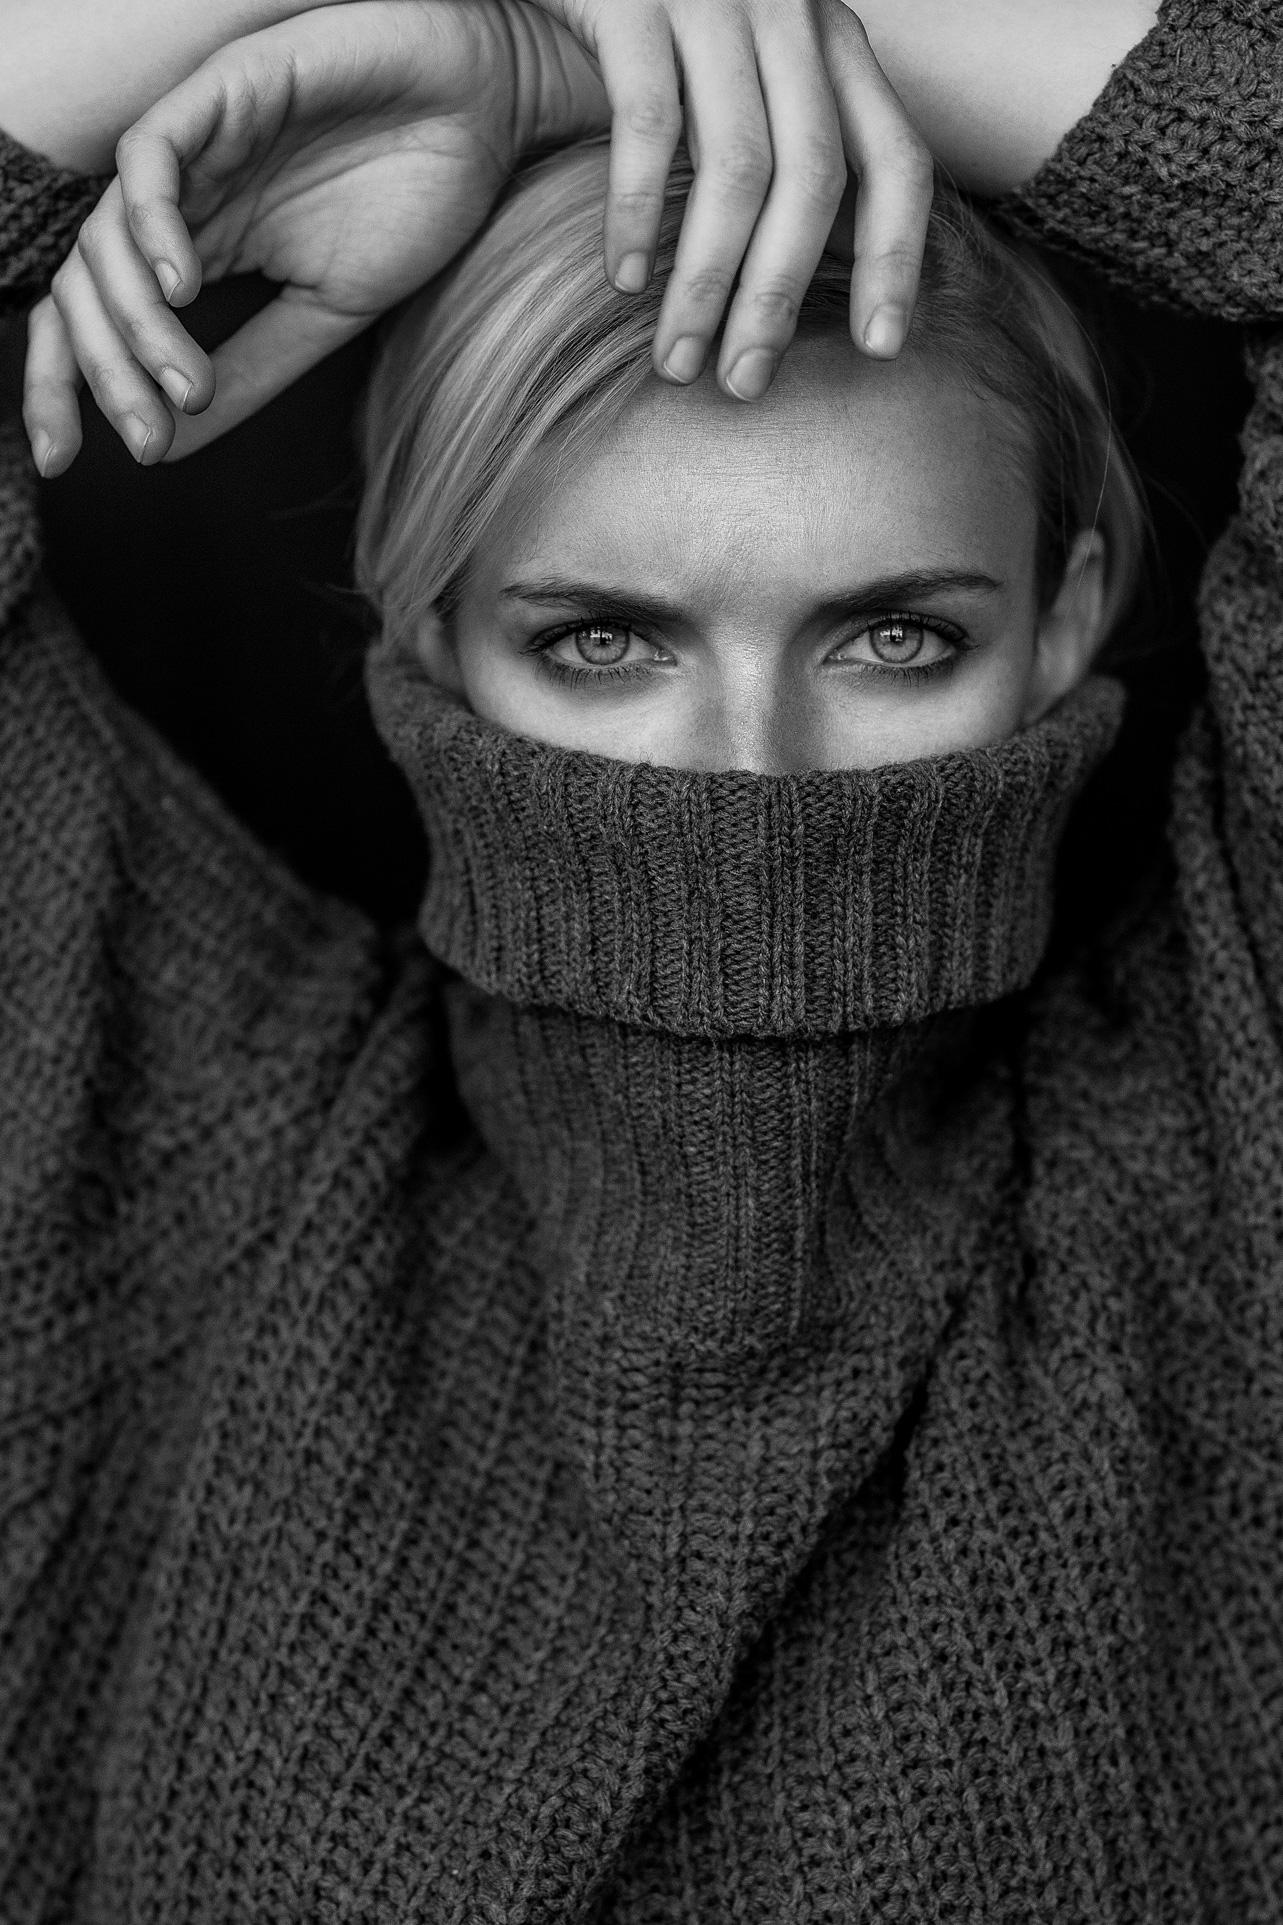 Weronika---Sweater(peek)-copy.jpg